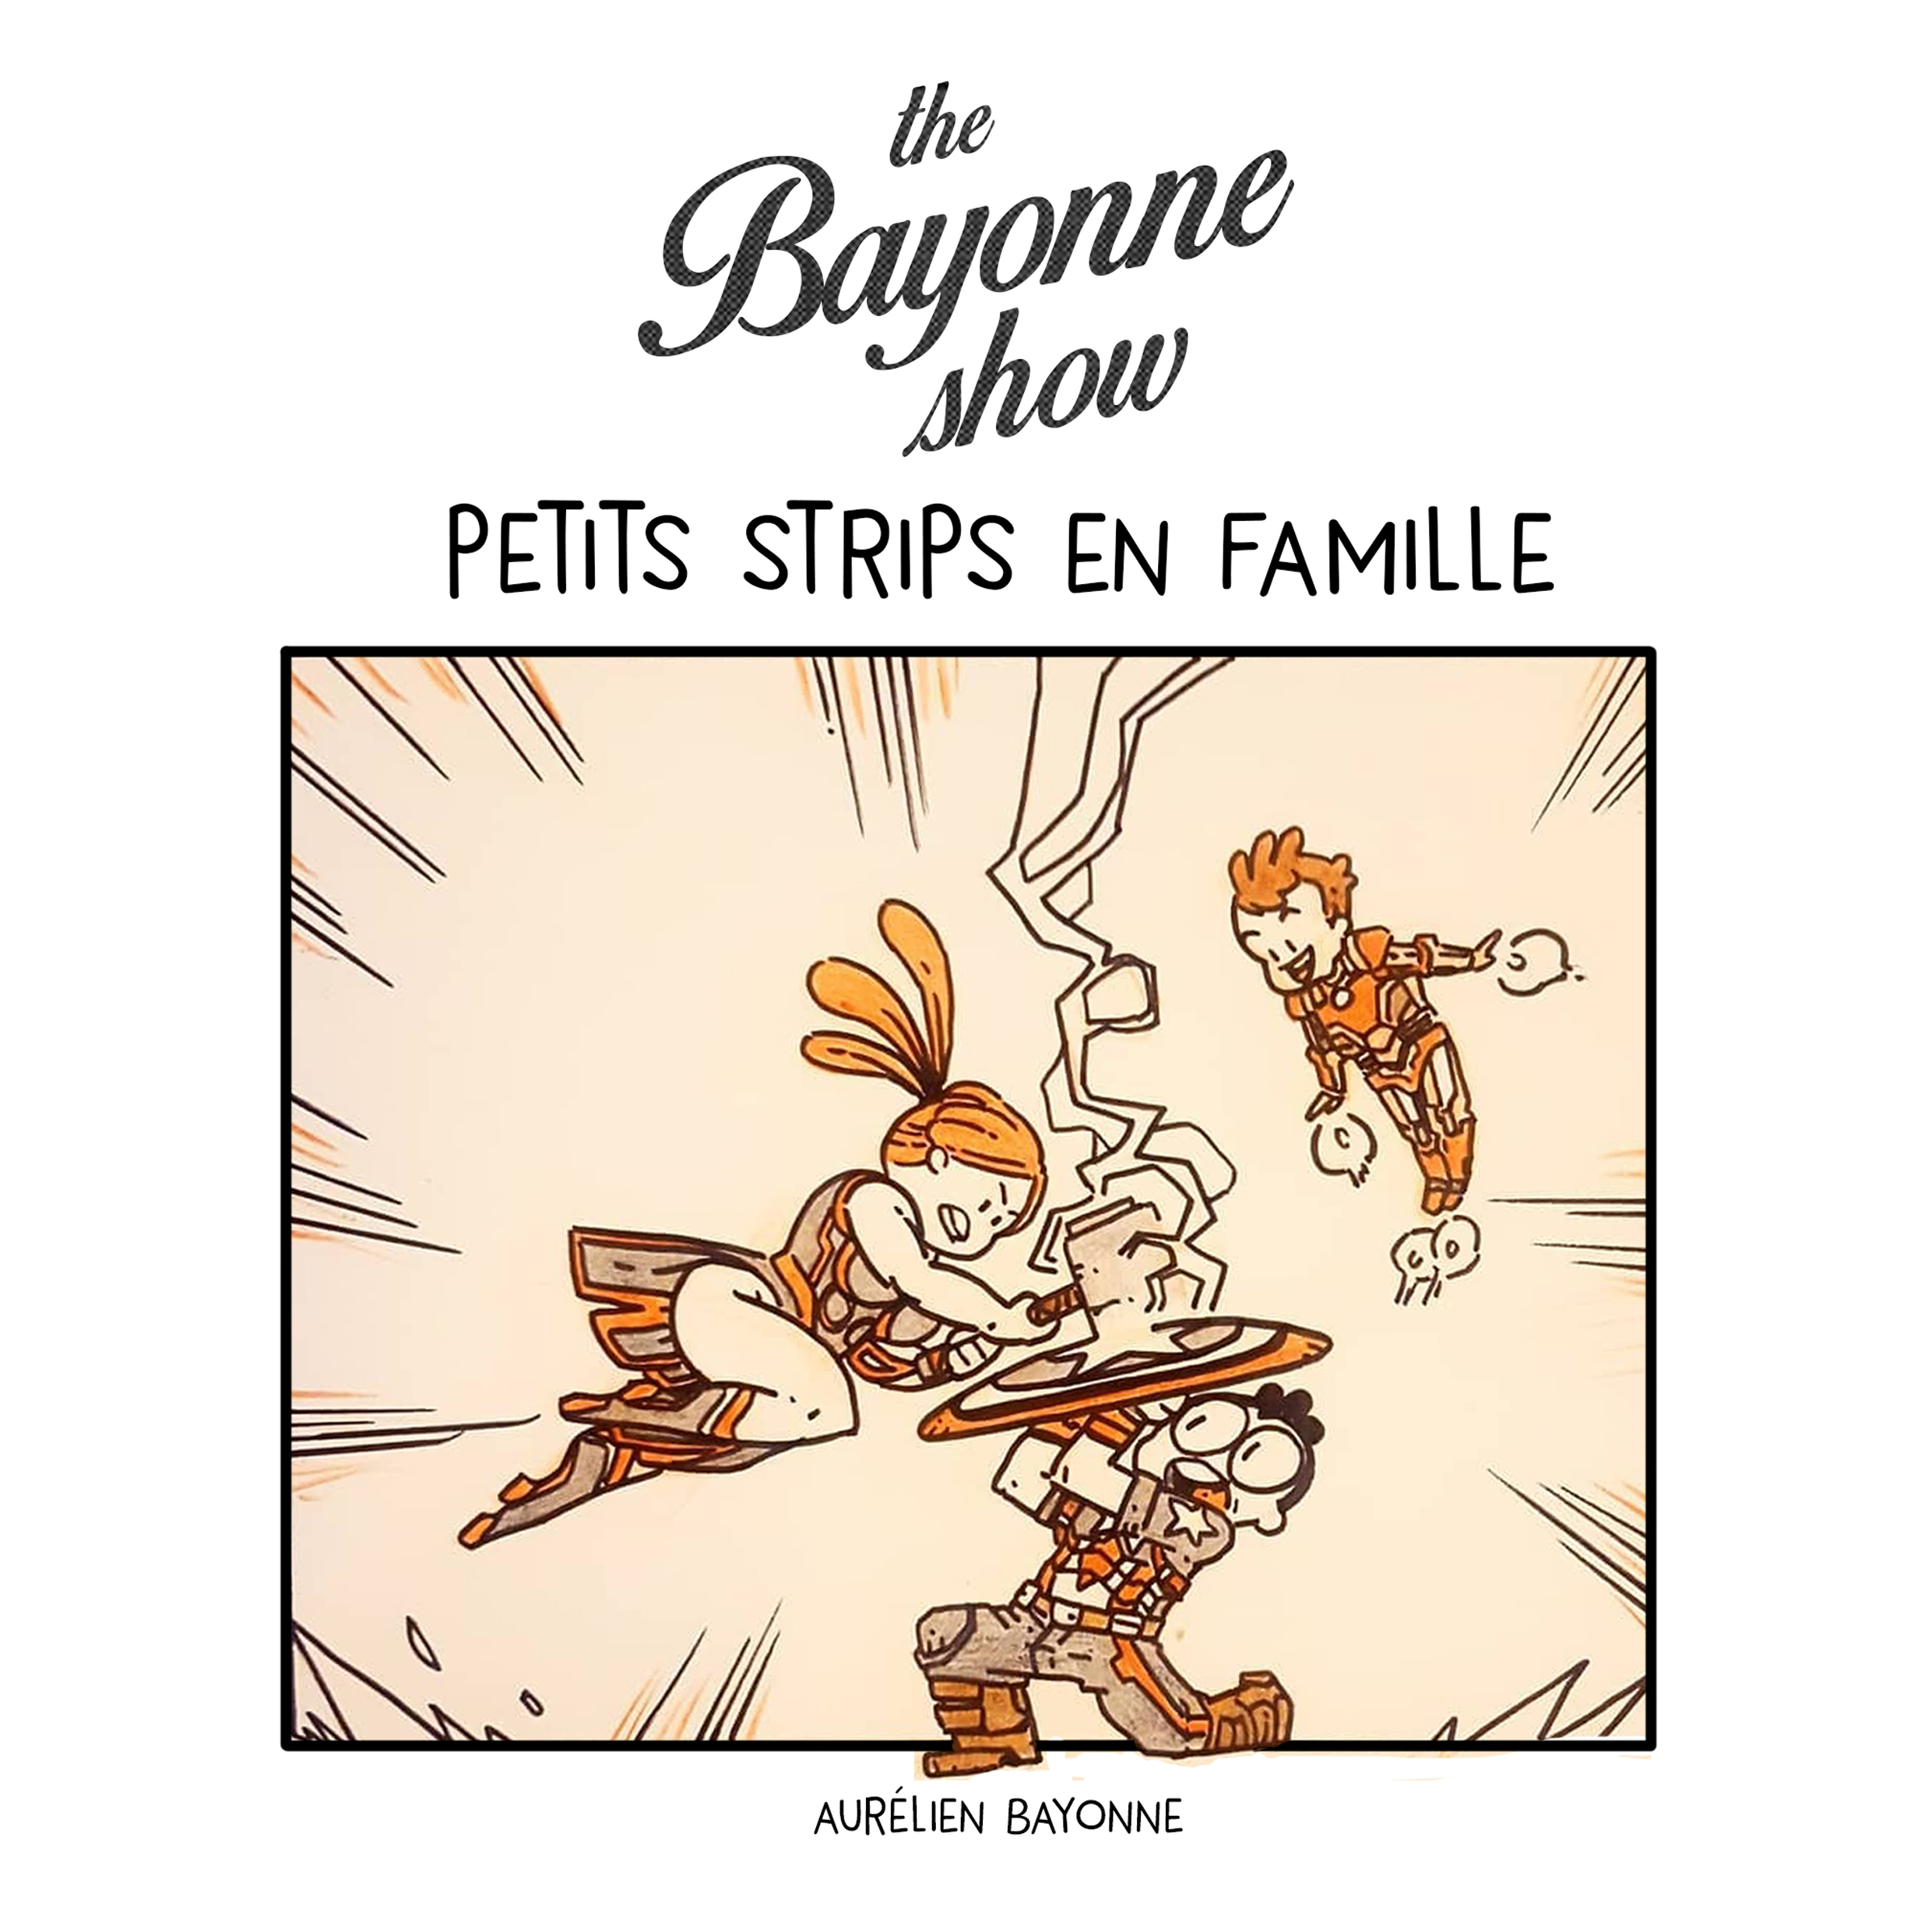 The Bayonne Show